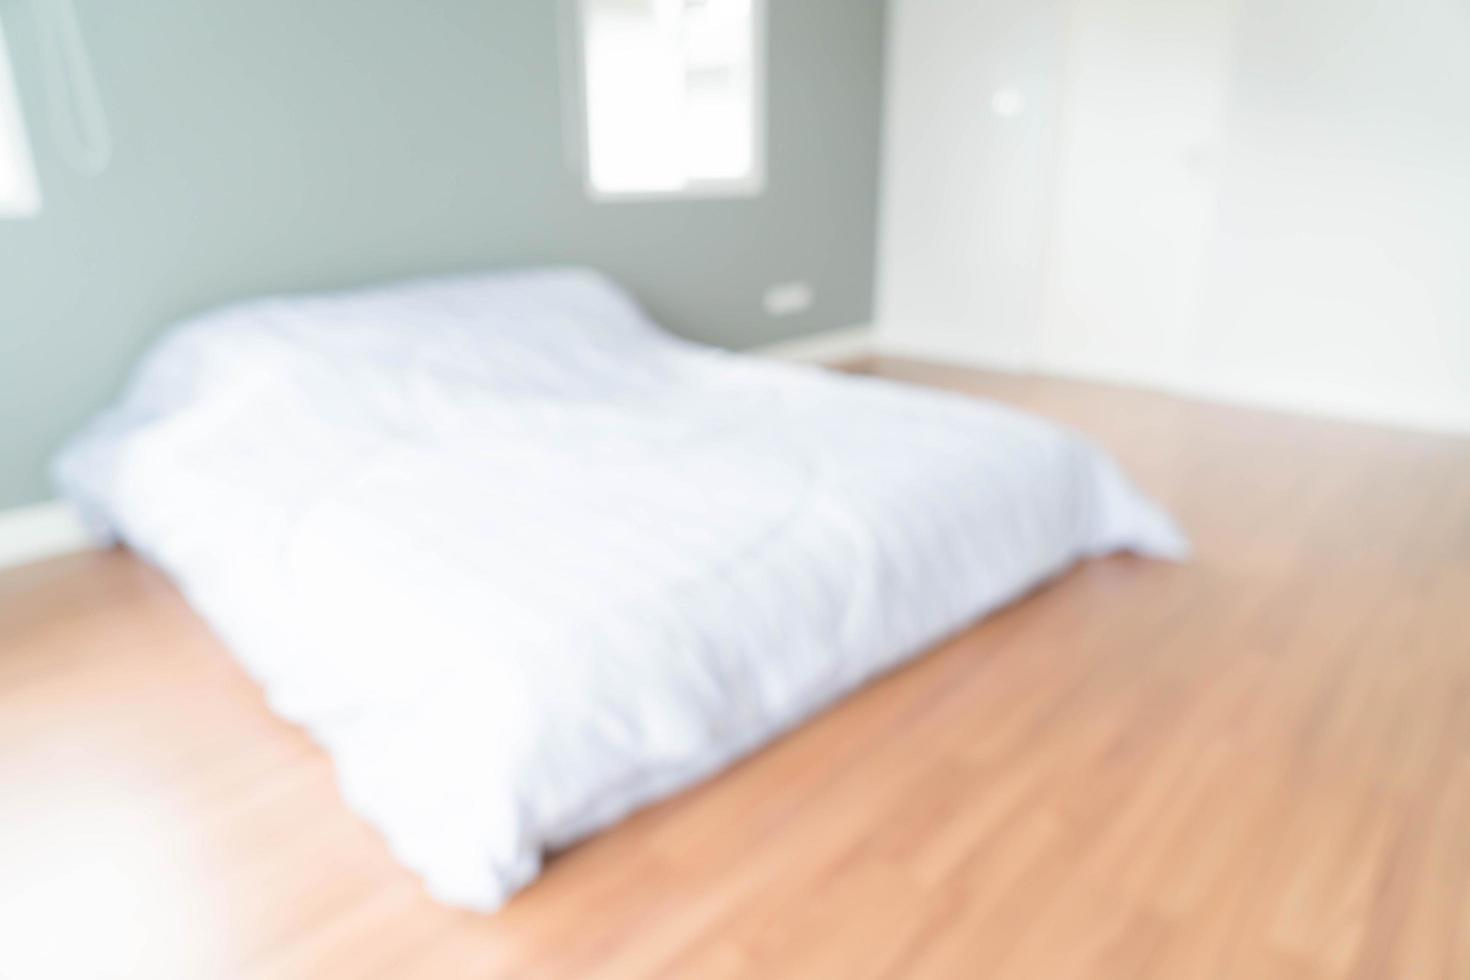 Abstract blur bedroom interior photo